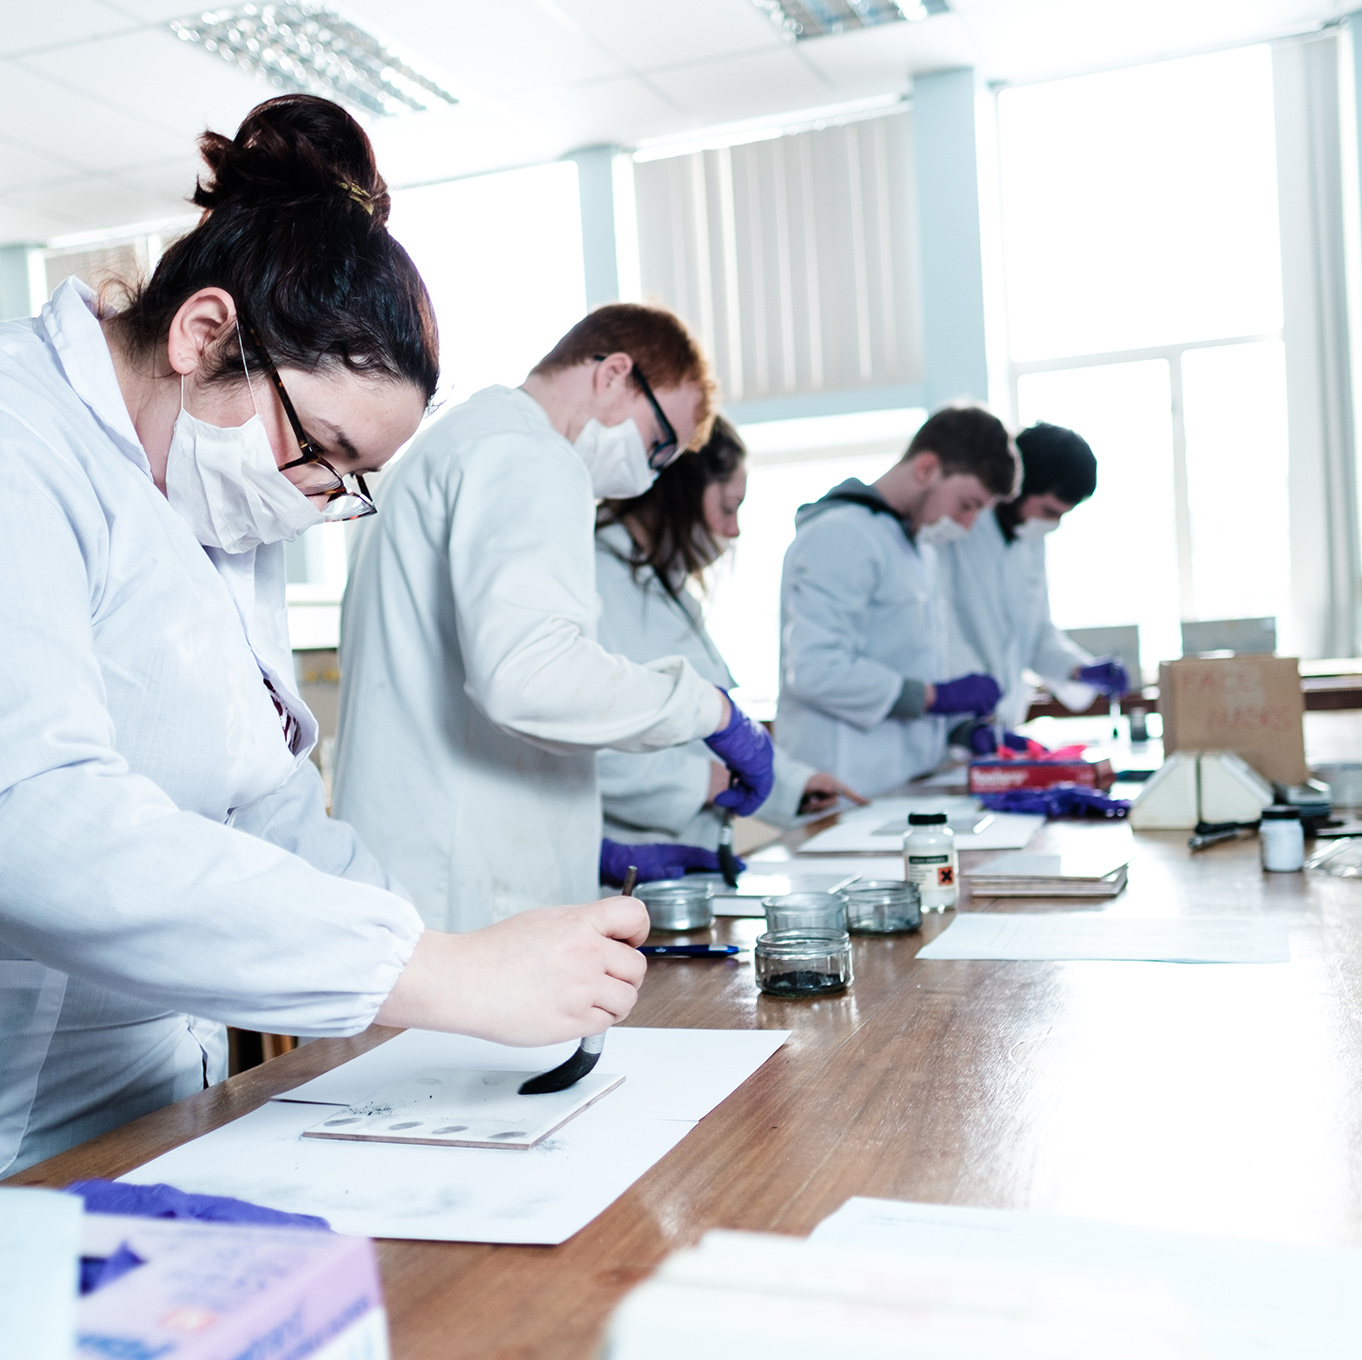 Forensic Science students dust for fingerprints